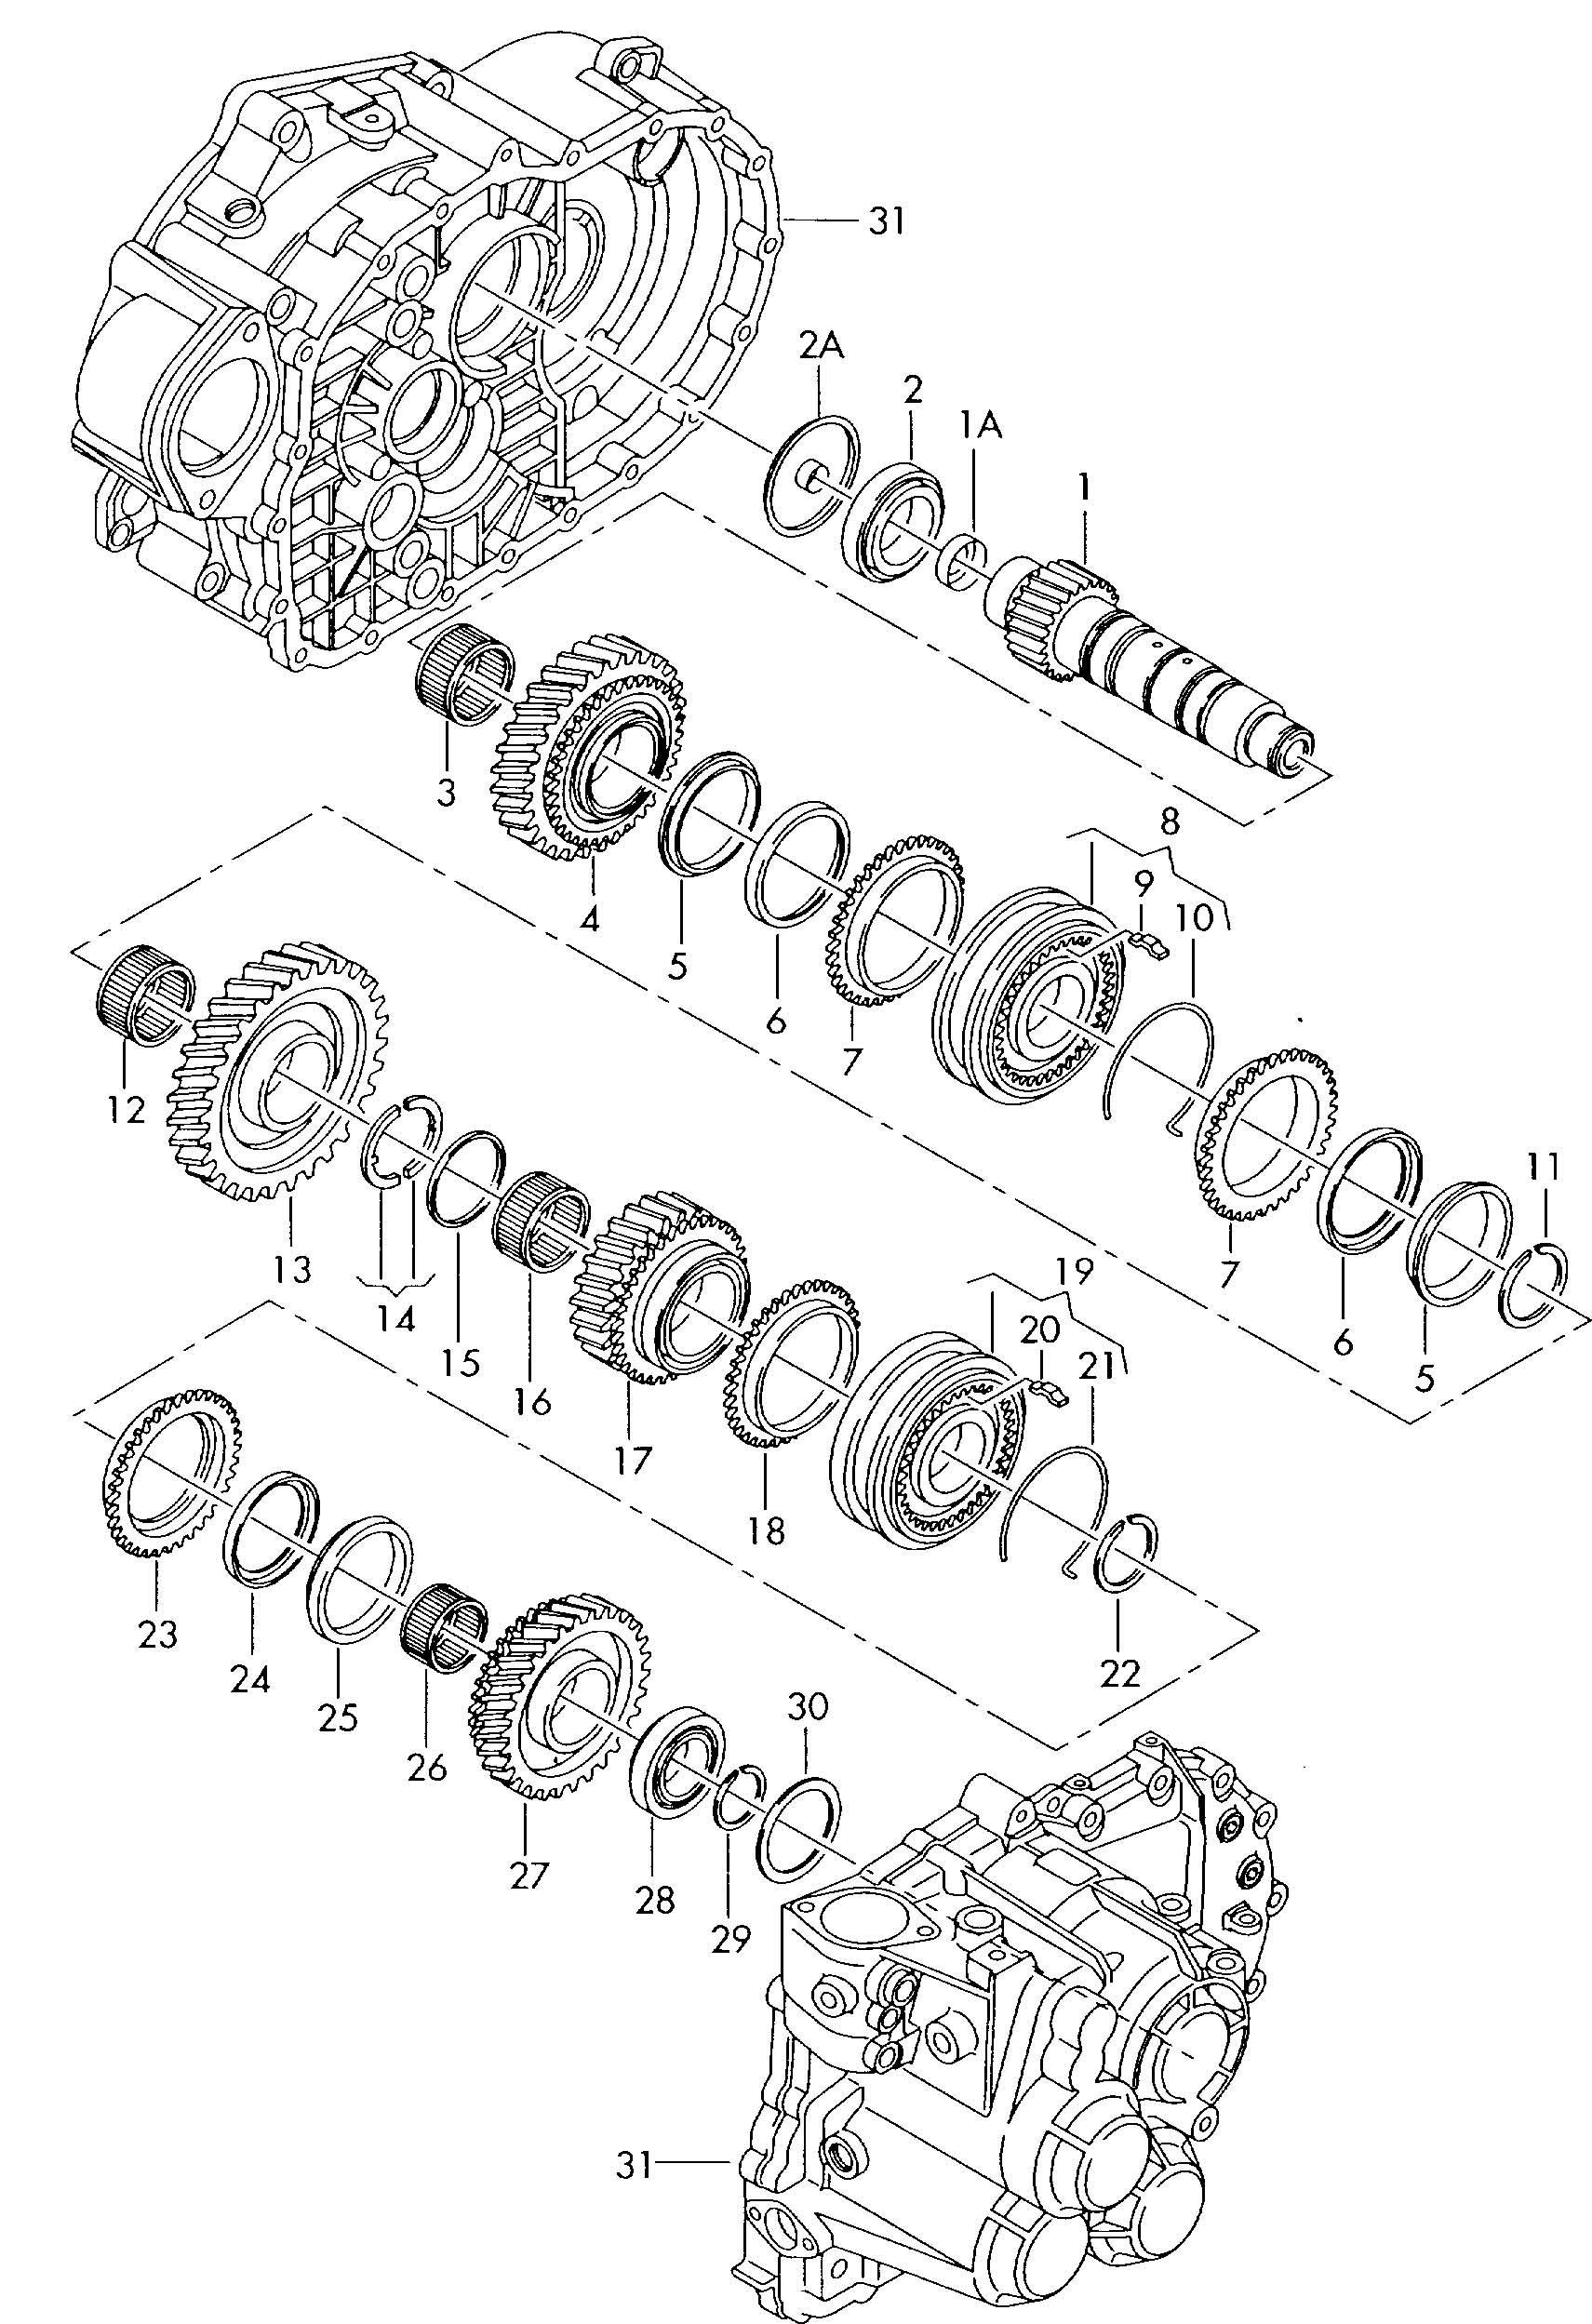 vw beetle transmission diagram 1989 volvo 240 radio wiring volkswagen free